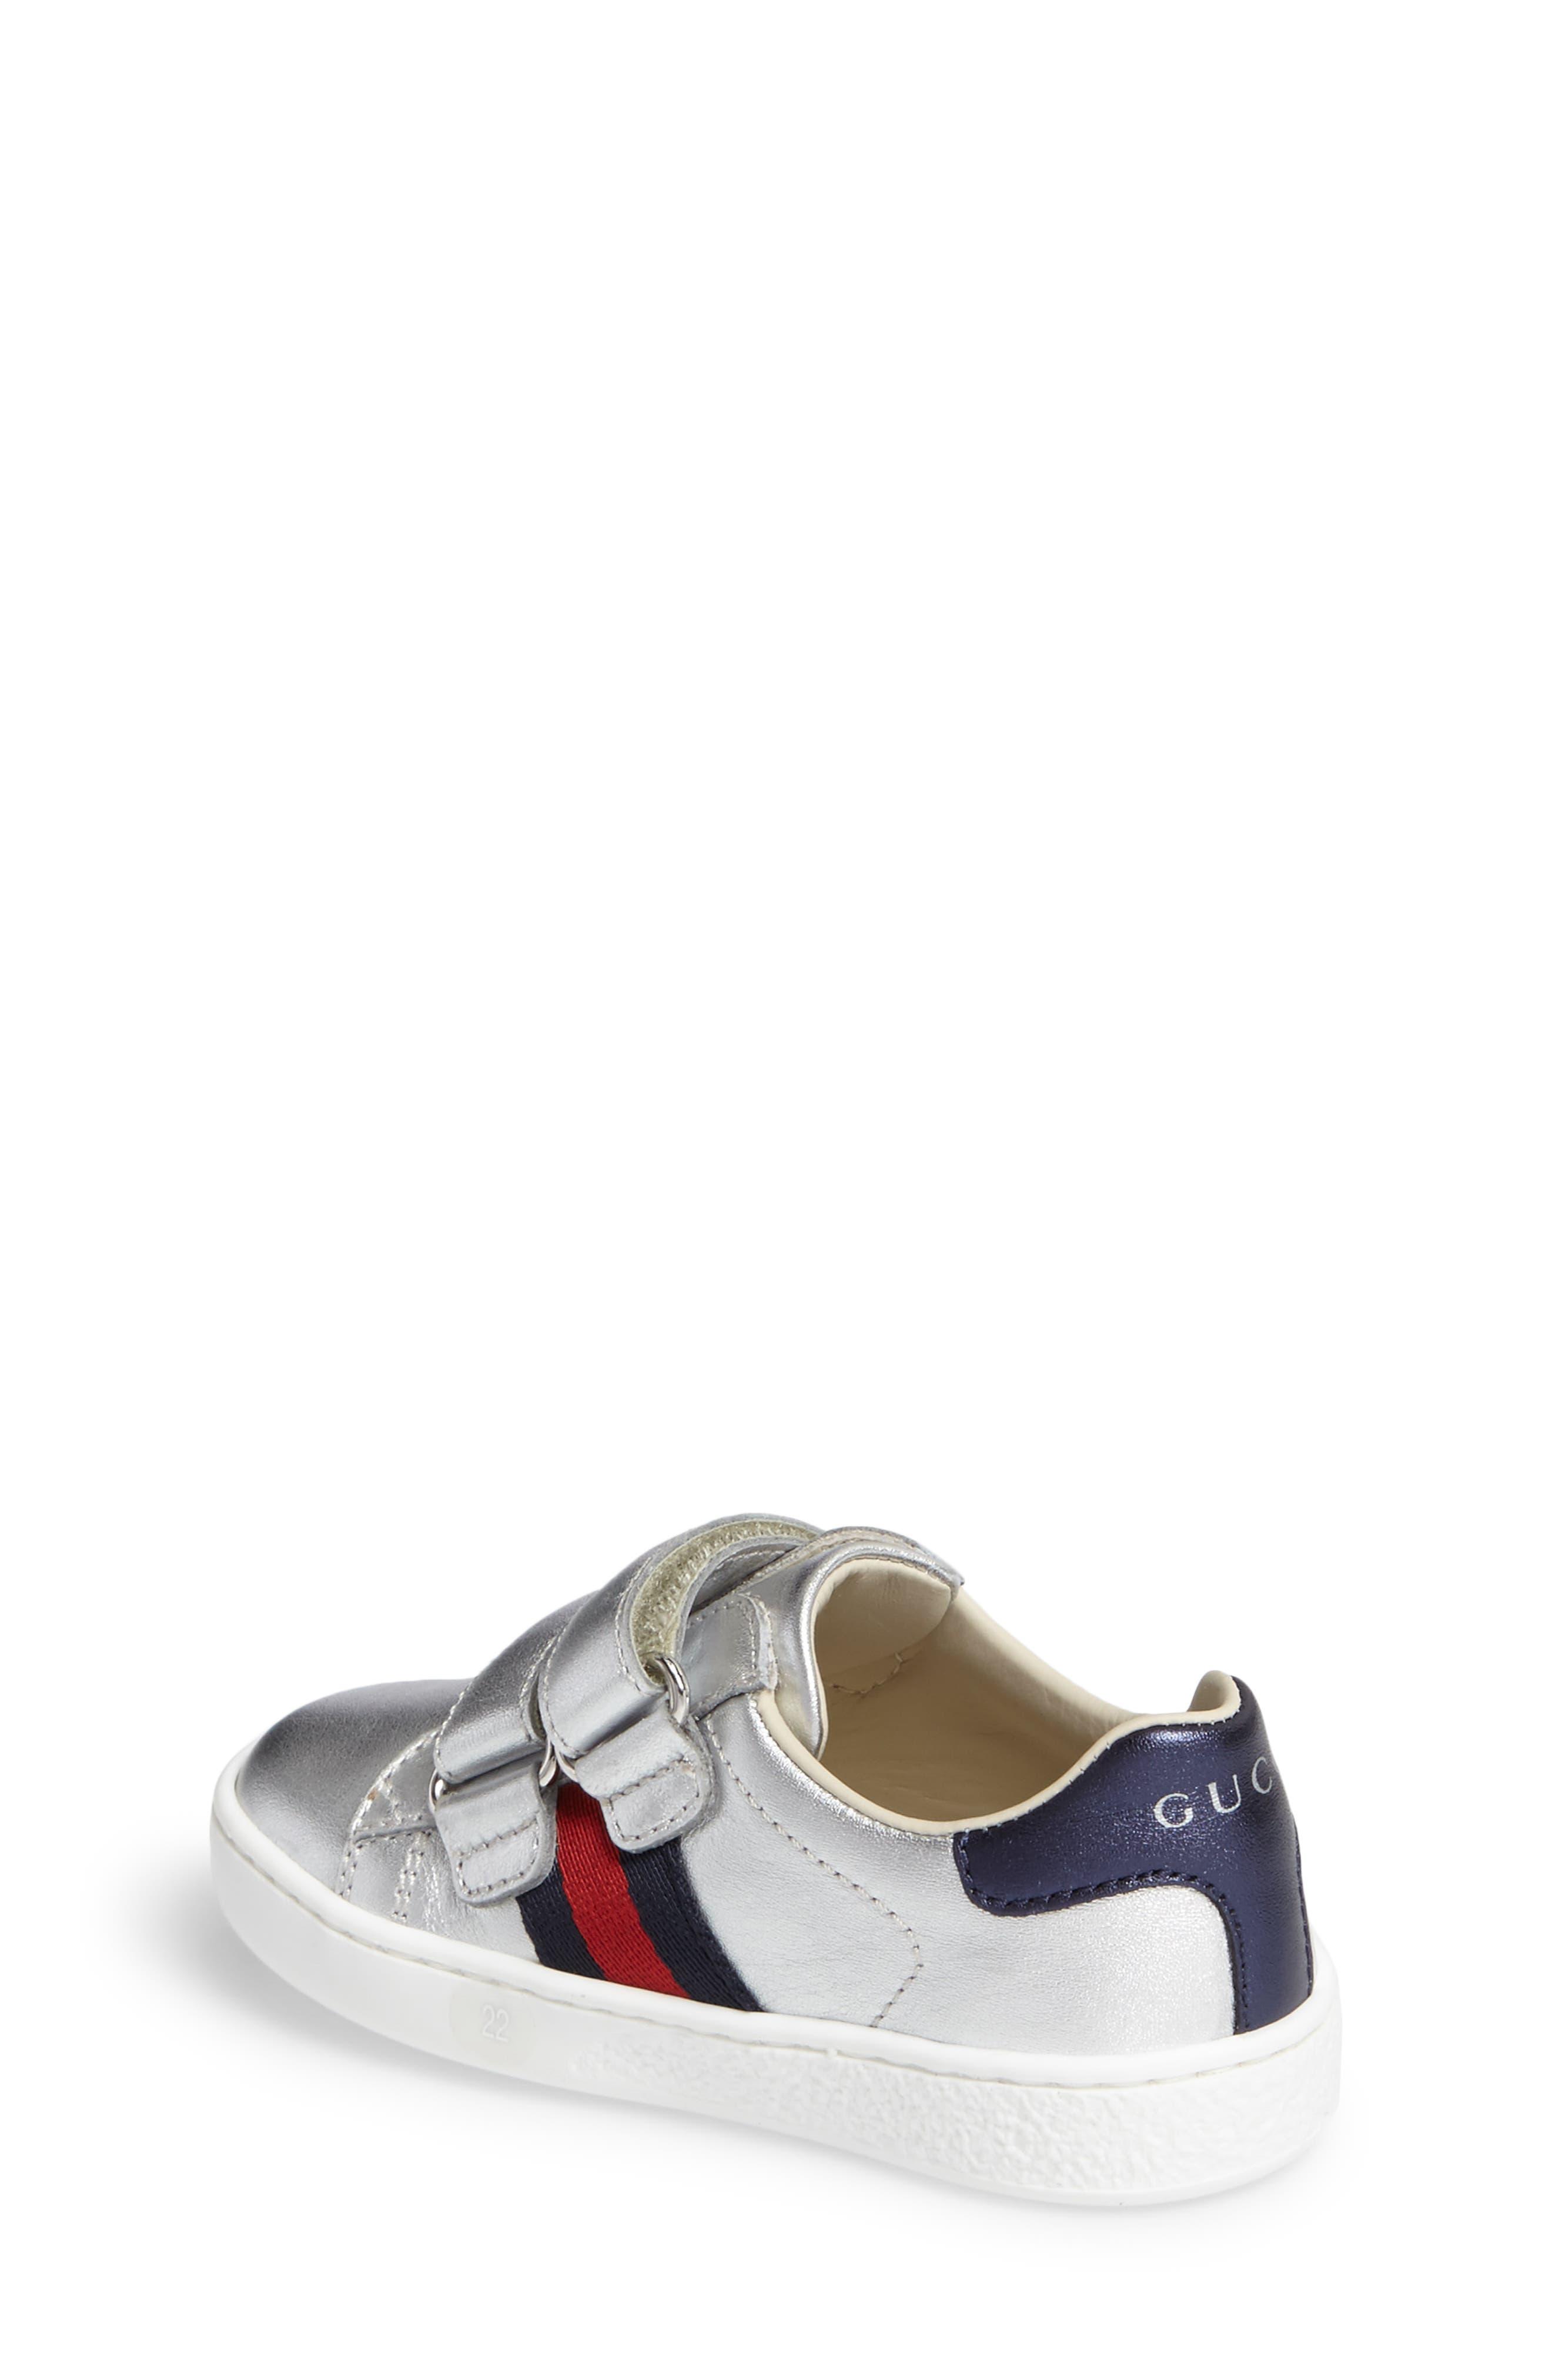 Alternate Image 2  - Gucci New Ace Sneaker (Baby, Walker, Toddler & Little Kid)